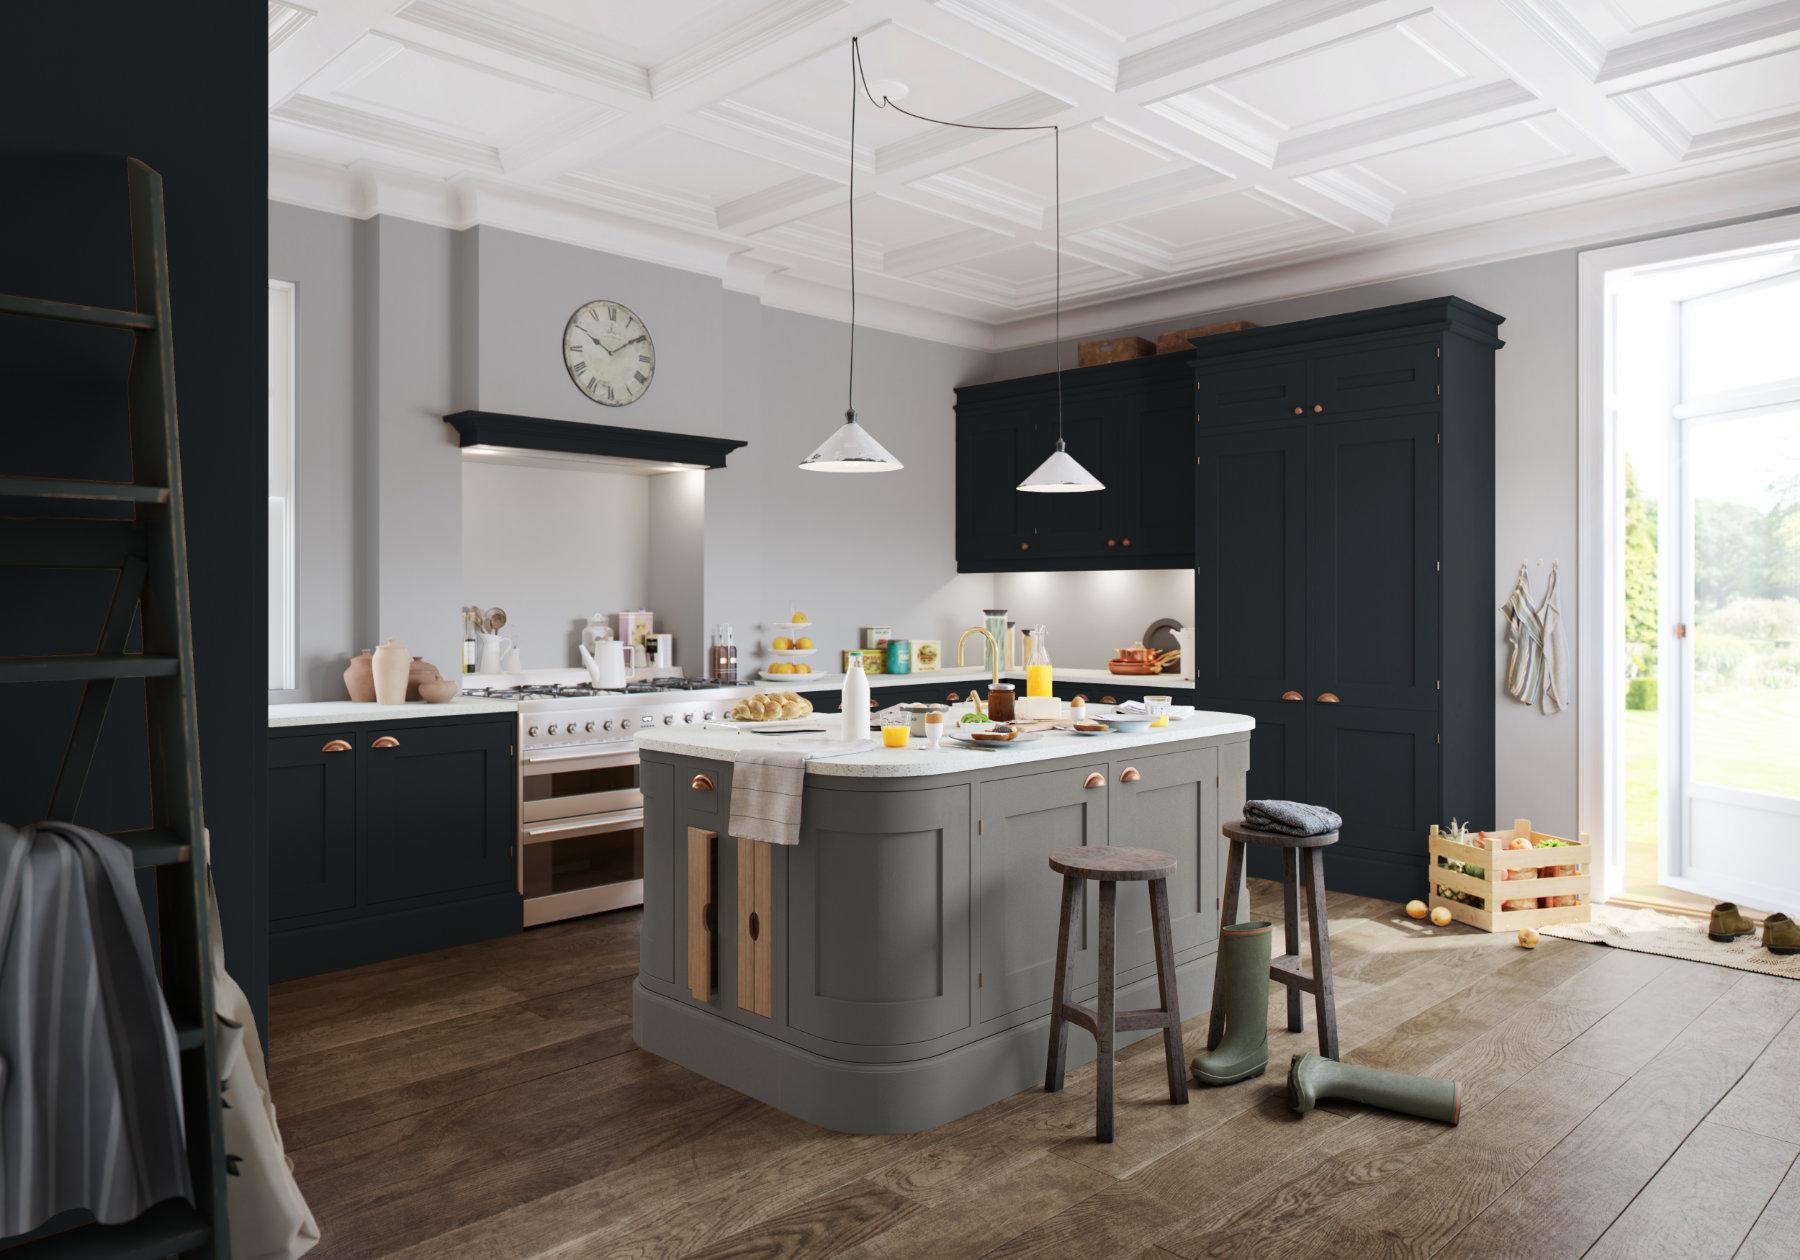 Manor Interiors Shaker L Shaped Kitchen With Island | MHK Kitchen Experts